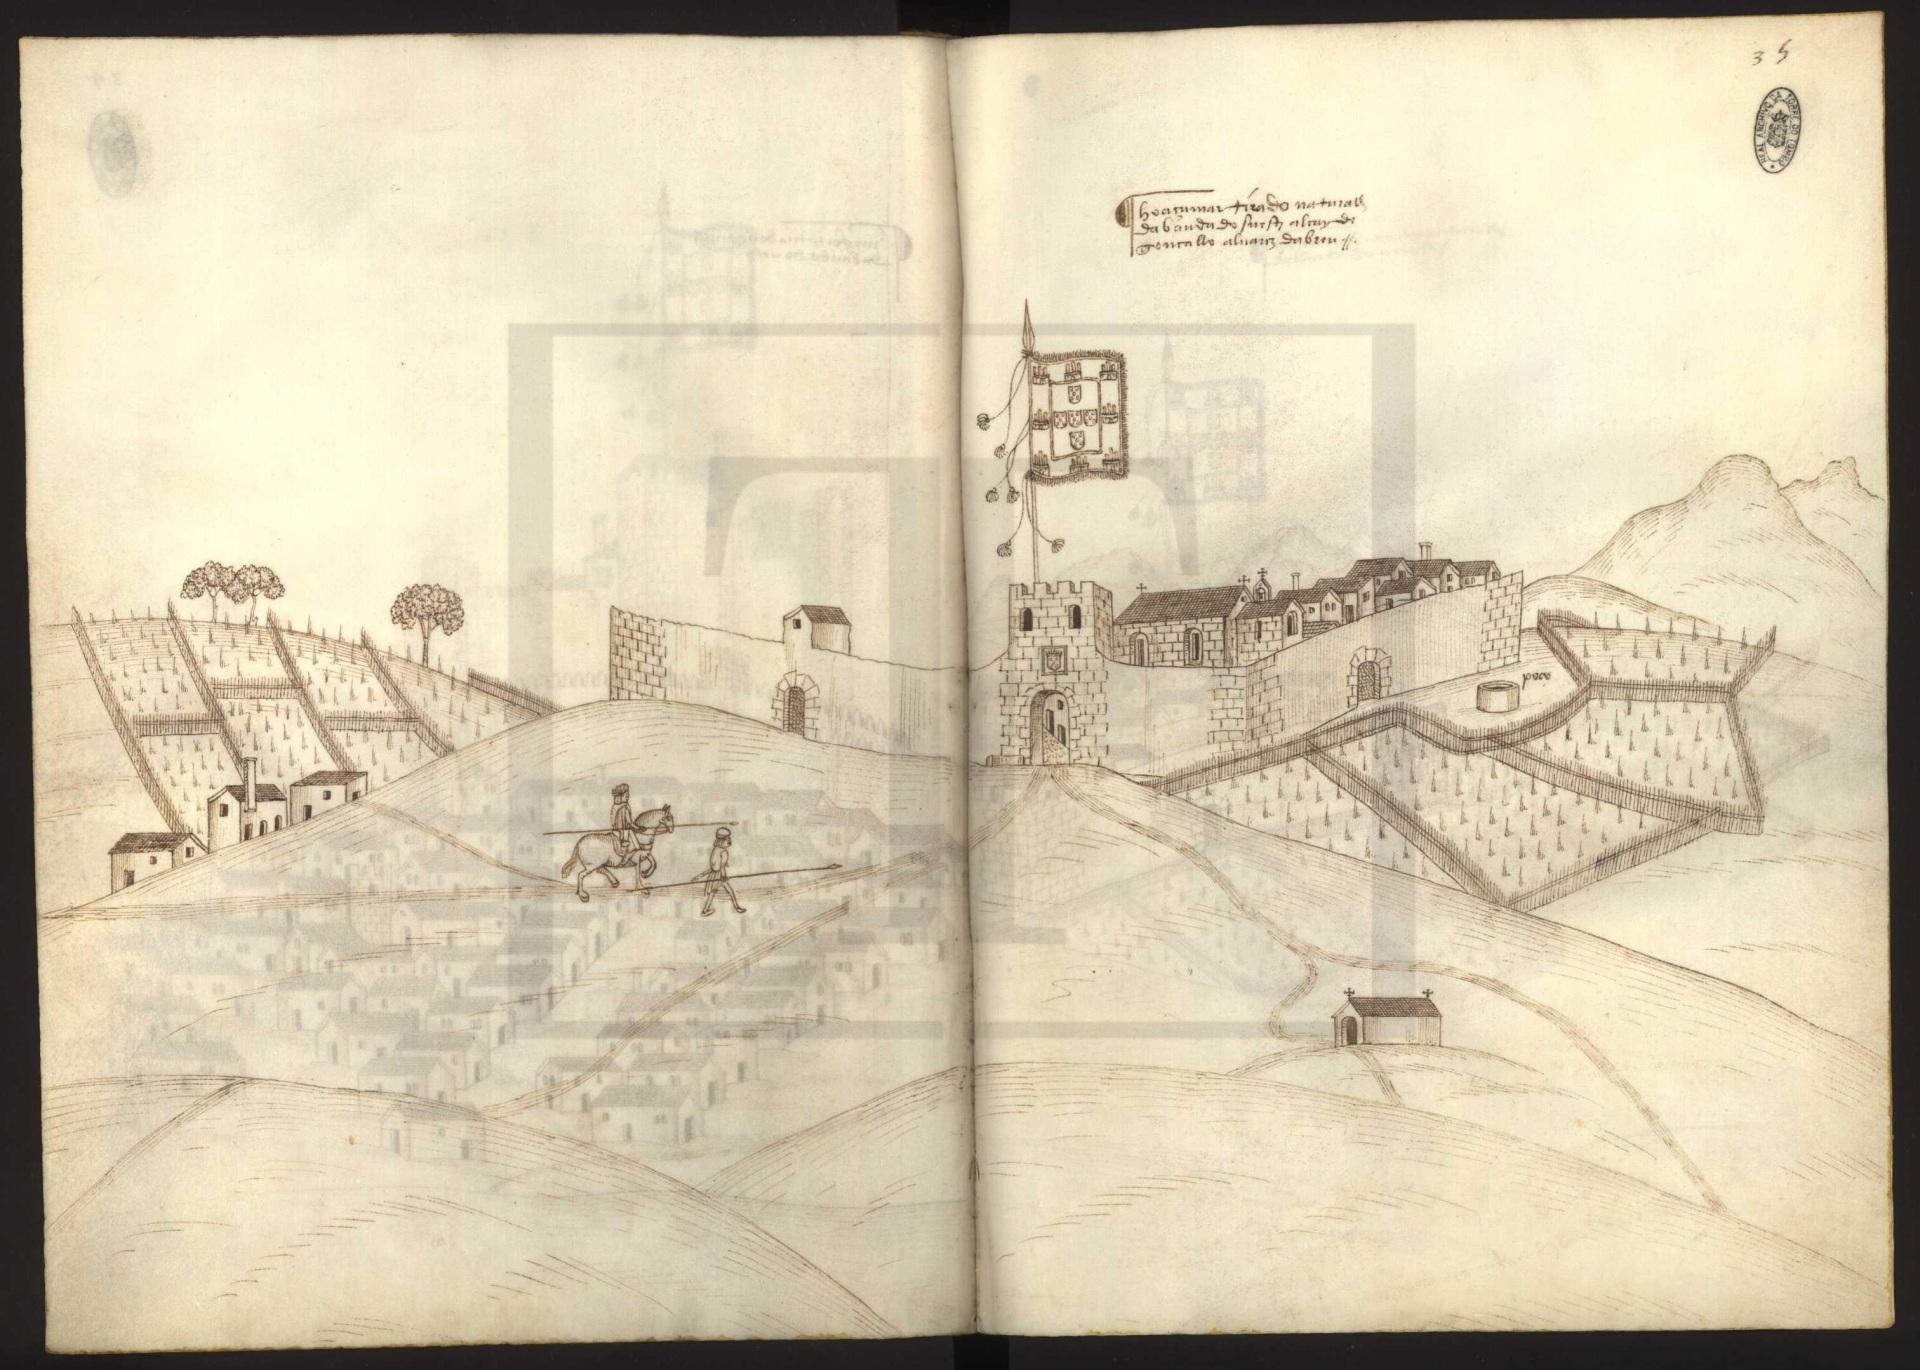 O cerco de Monforte e Tomada do Castelo de Arronches